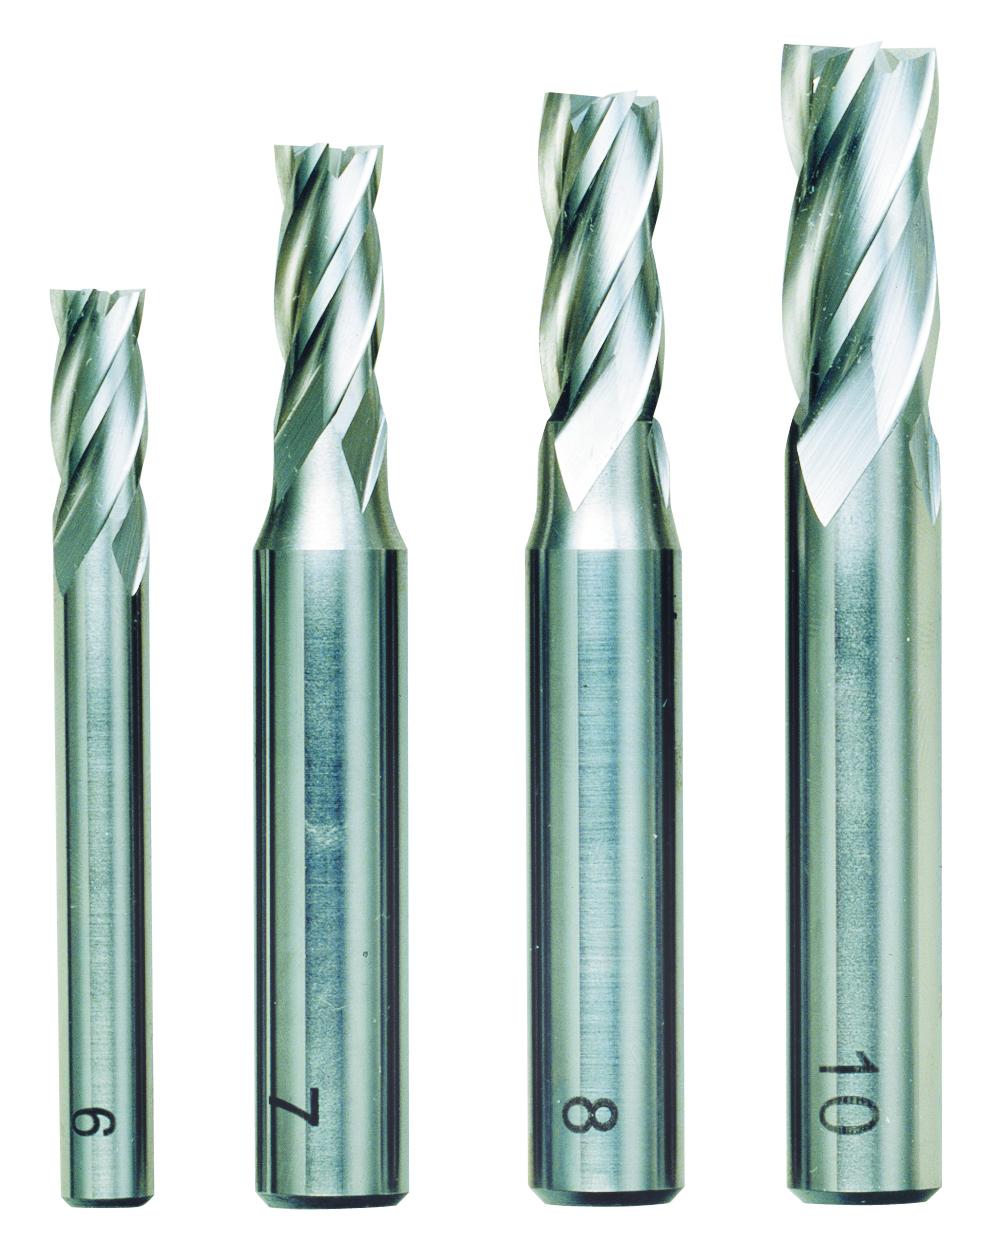 Proxxon Schaftfräsersatz (6-10 mm), 4-tlg. 24620